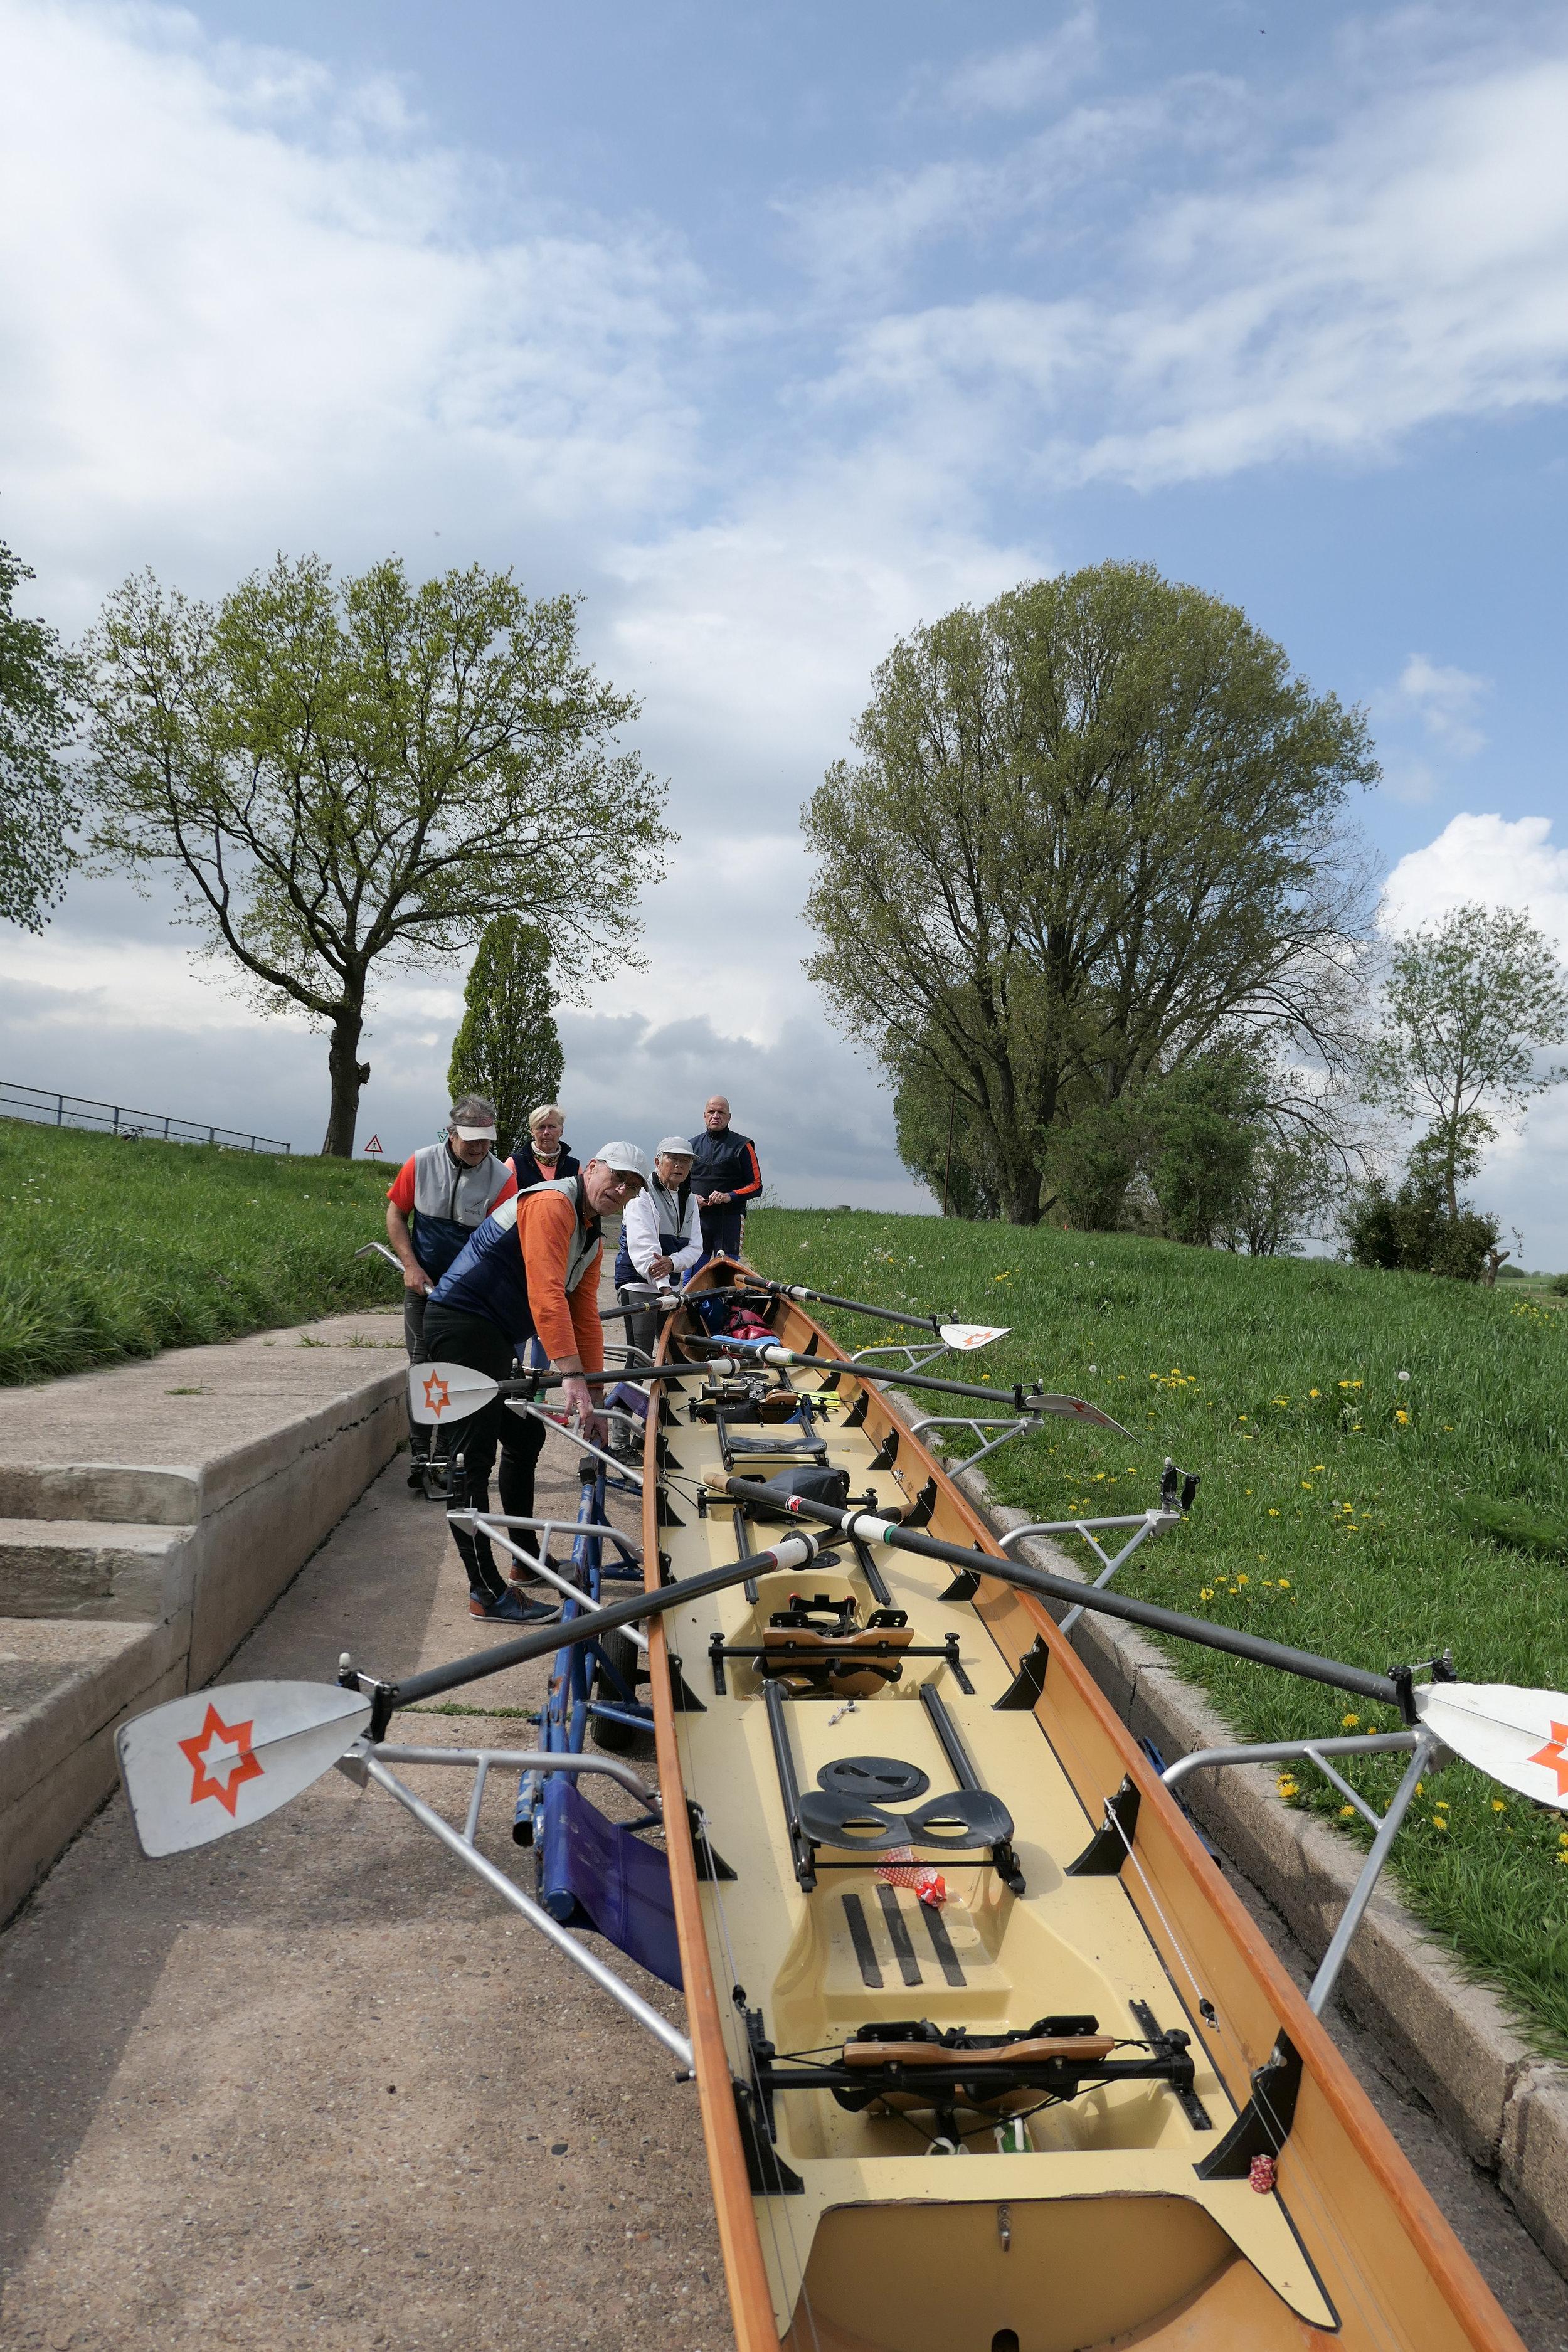 maiwanderfahrt-weser-2019-2_0073_2019-04-28_14-17-48.jpg